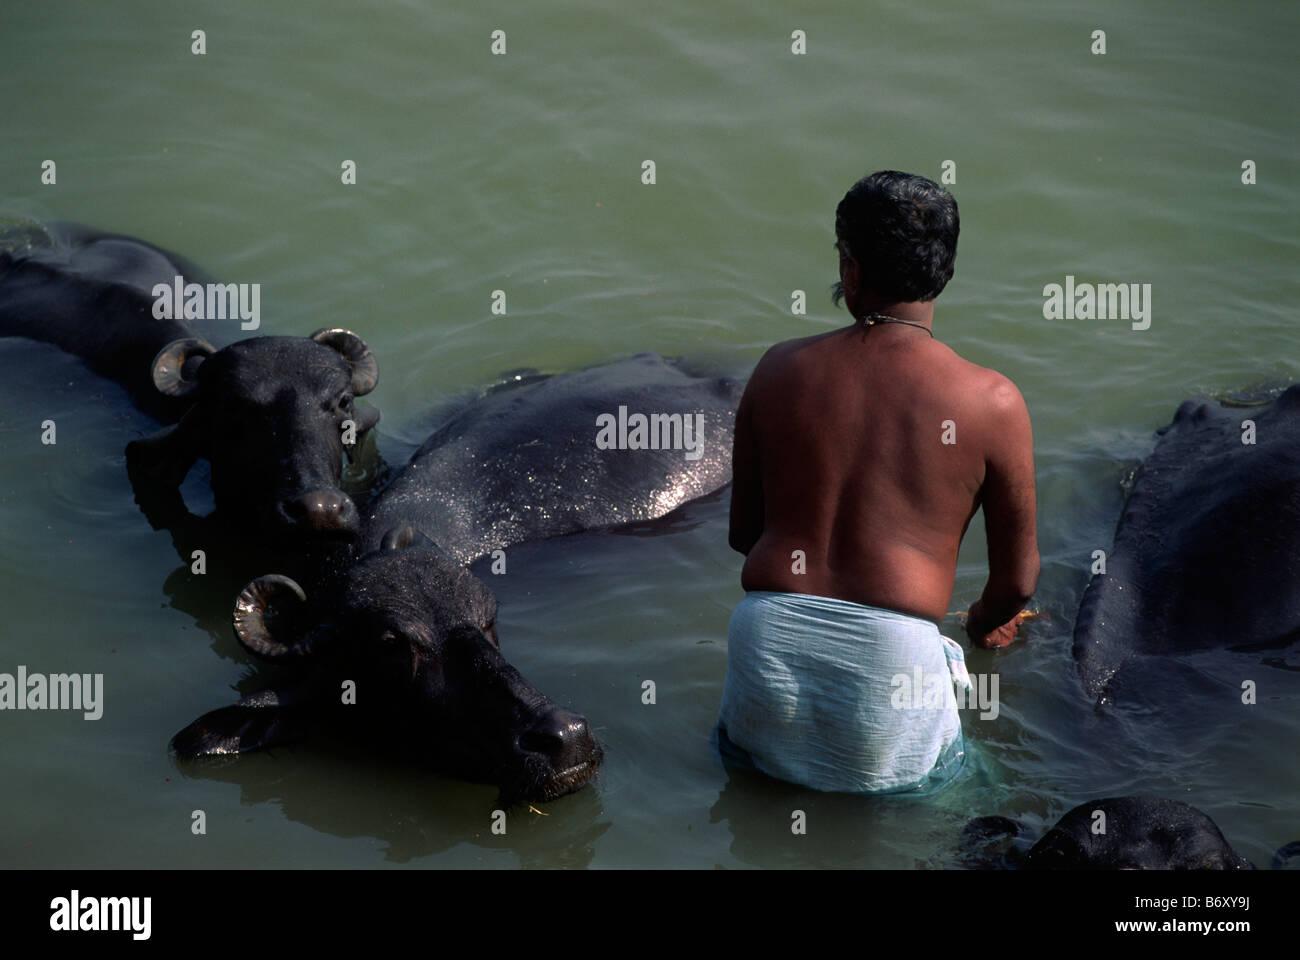 india, uttar pradesh, varanasi, ganges river, man and water buffalos - Stock Image